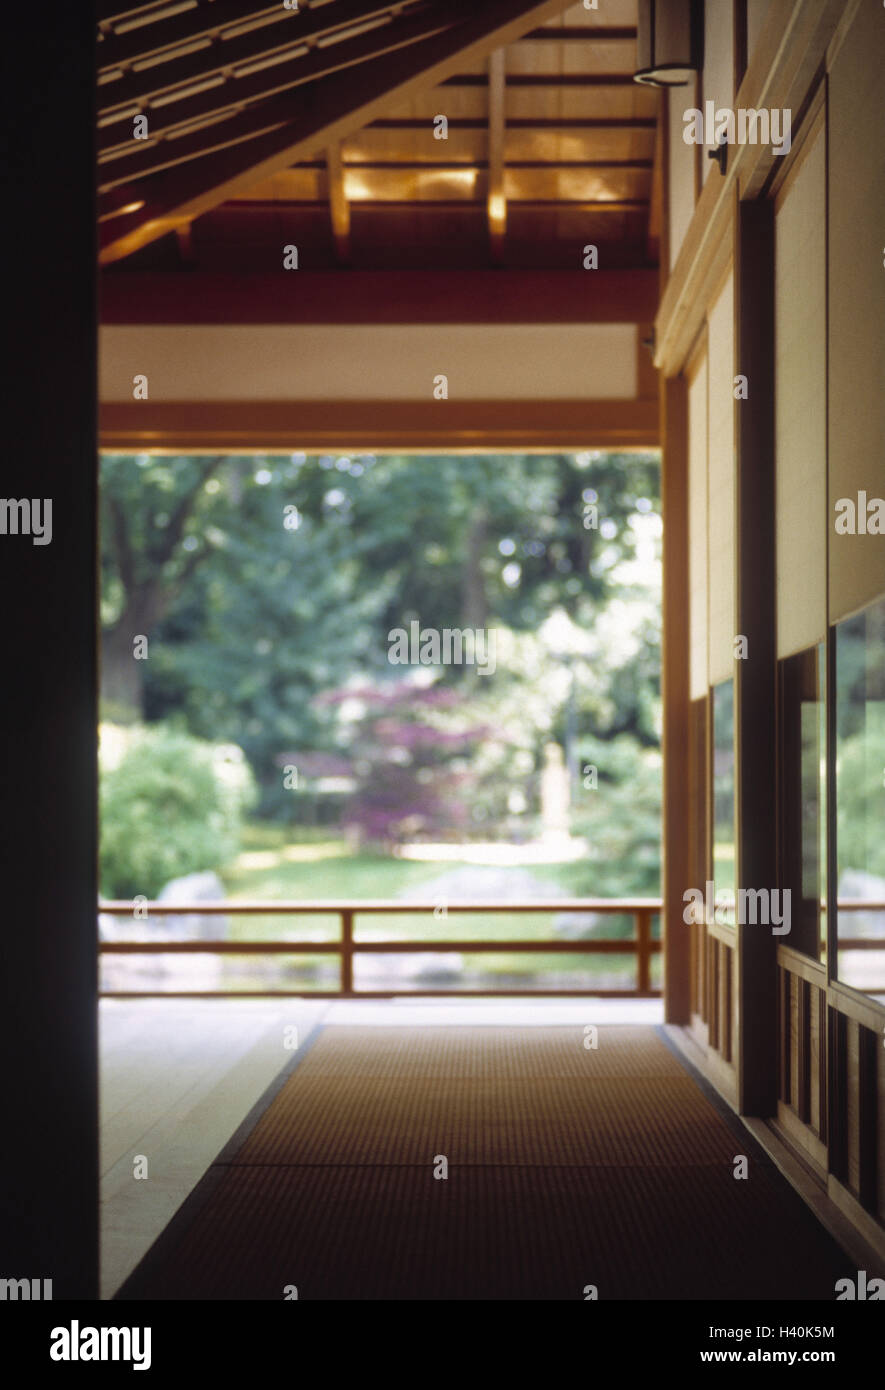 Belgien Hasselt Japanischer Garten Teehaus Terrasse Detail